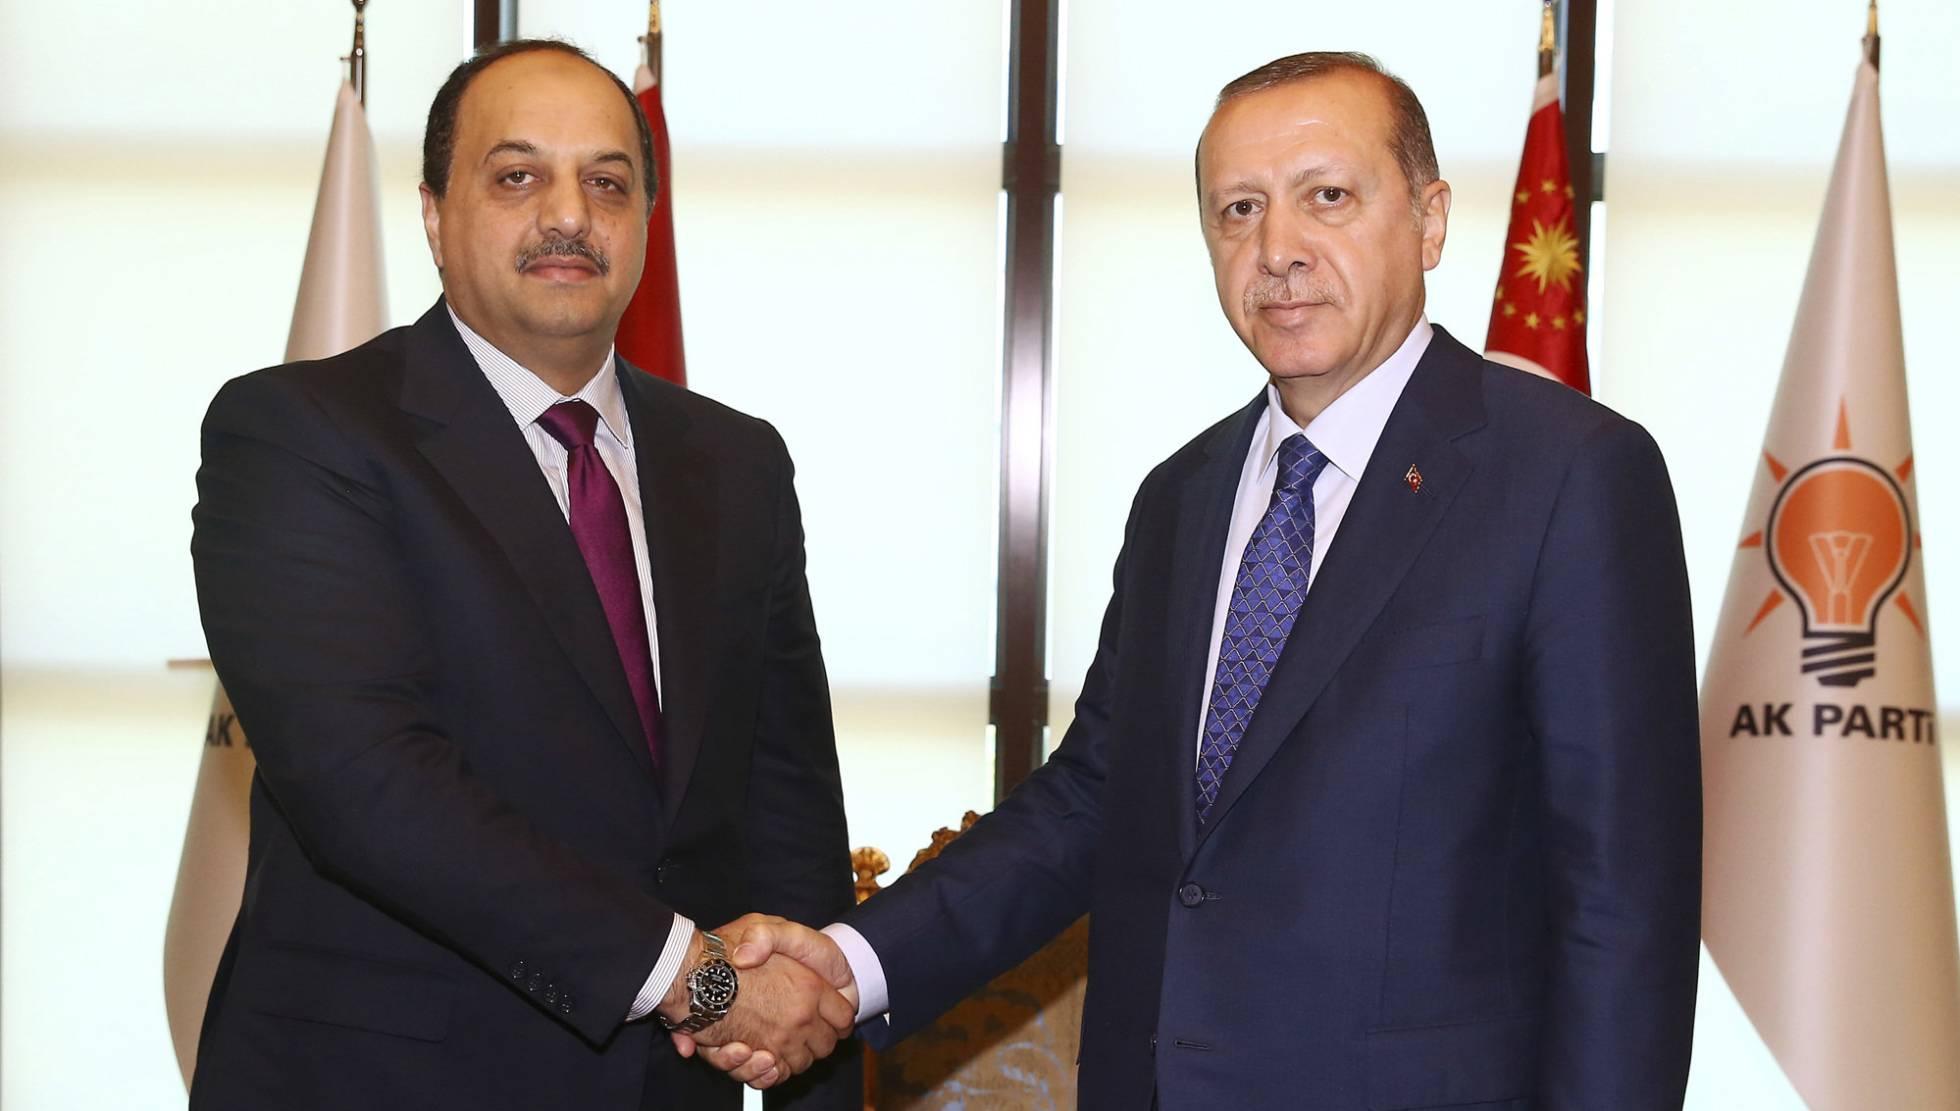 Arabia Saudita, Egipto, Bahréin y Emiratos Árabes Unidos cortaron relaciones diplomáticas con Qatar 1499010333_123252_1499016695_noticia_normal_recorte1